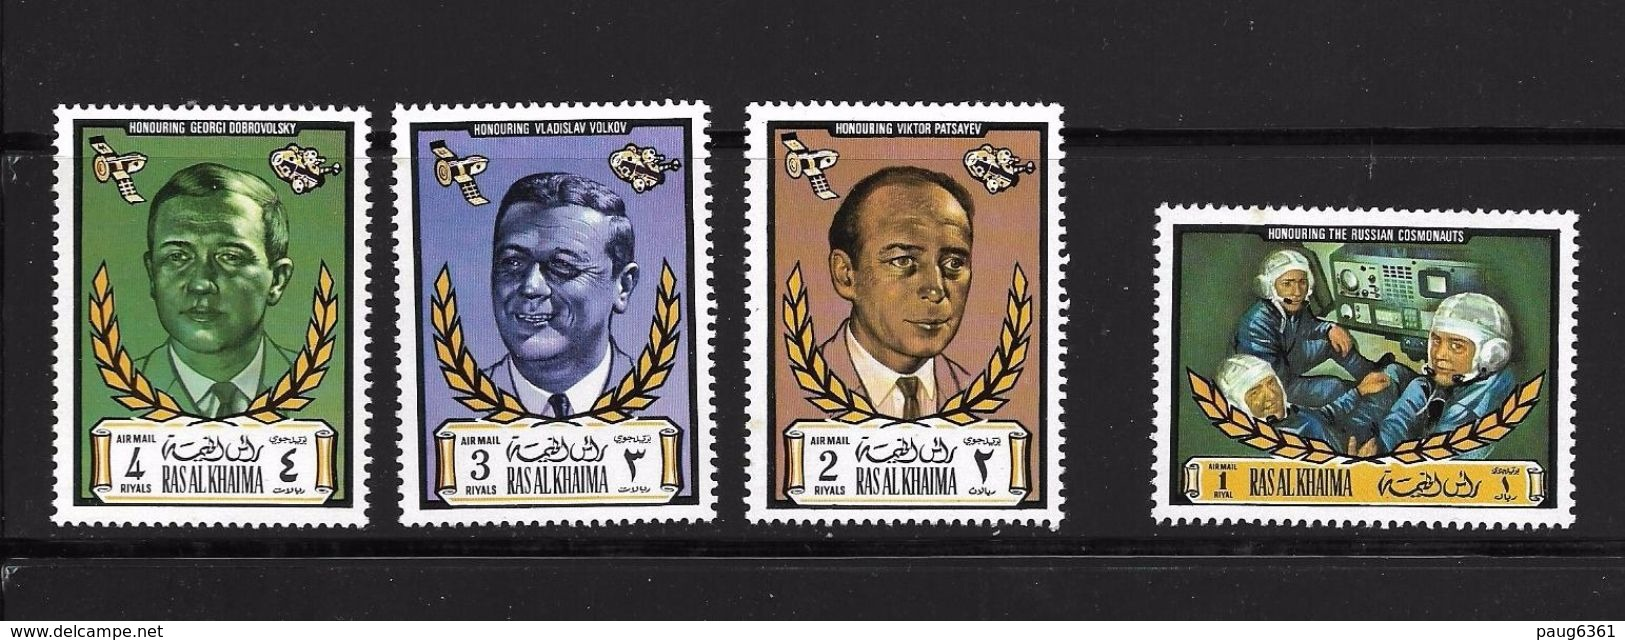 RAS ALKHAIMA 1971 COSMONAUTES RUSSES  YVERT N°77 NEUF MNH** - Space